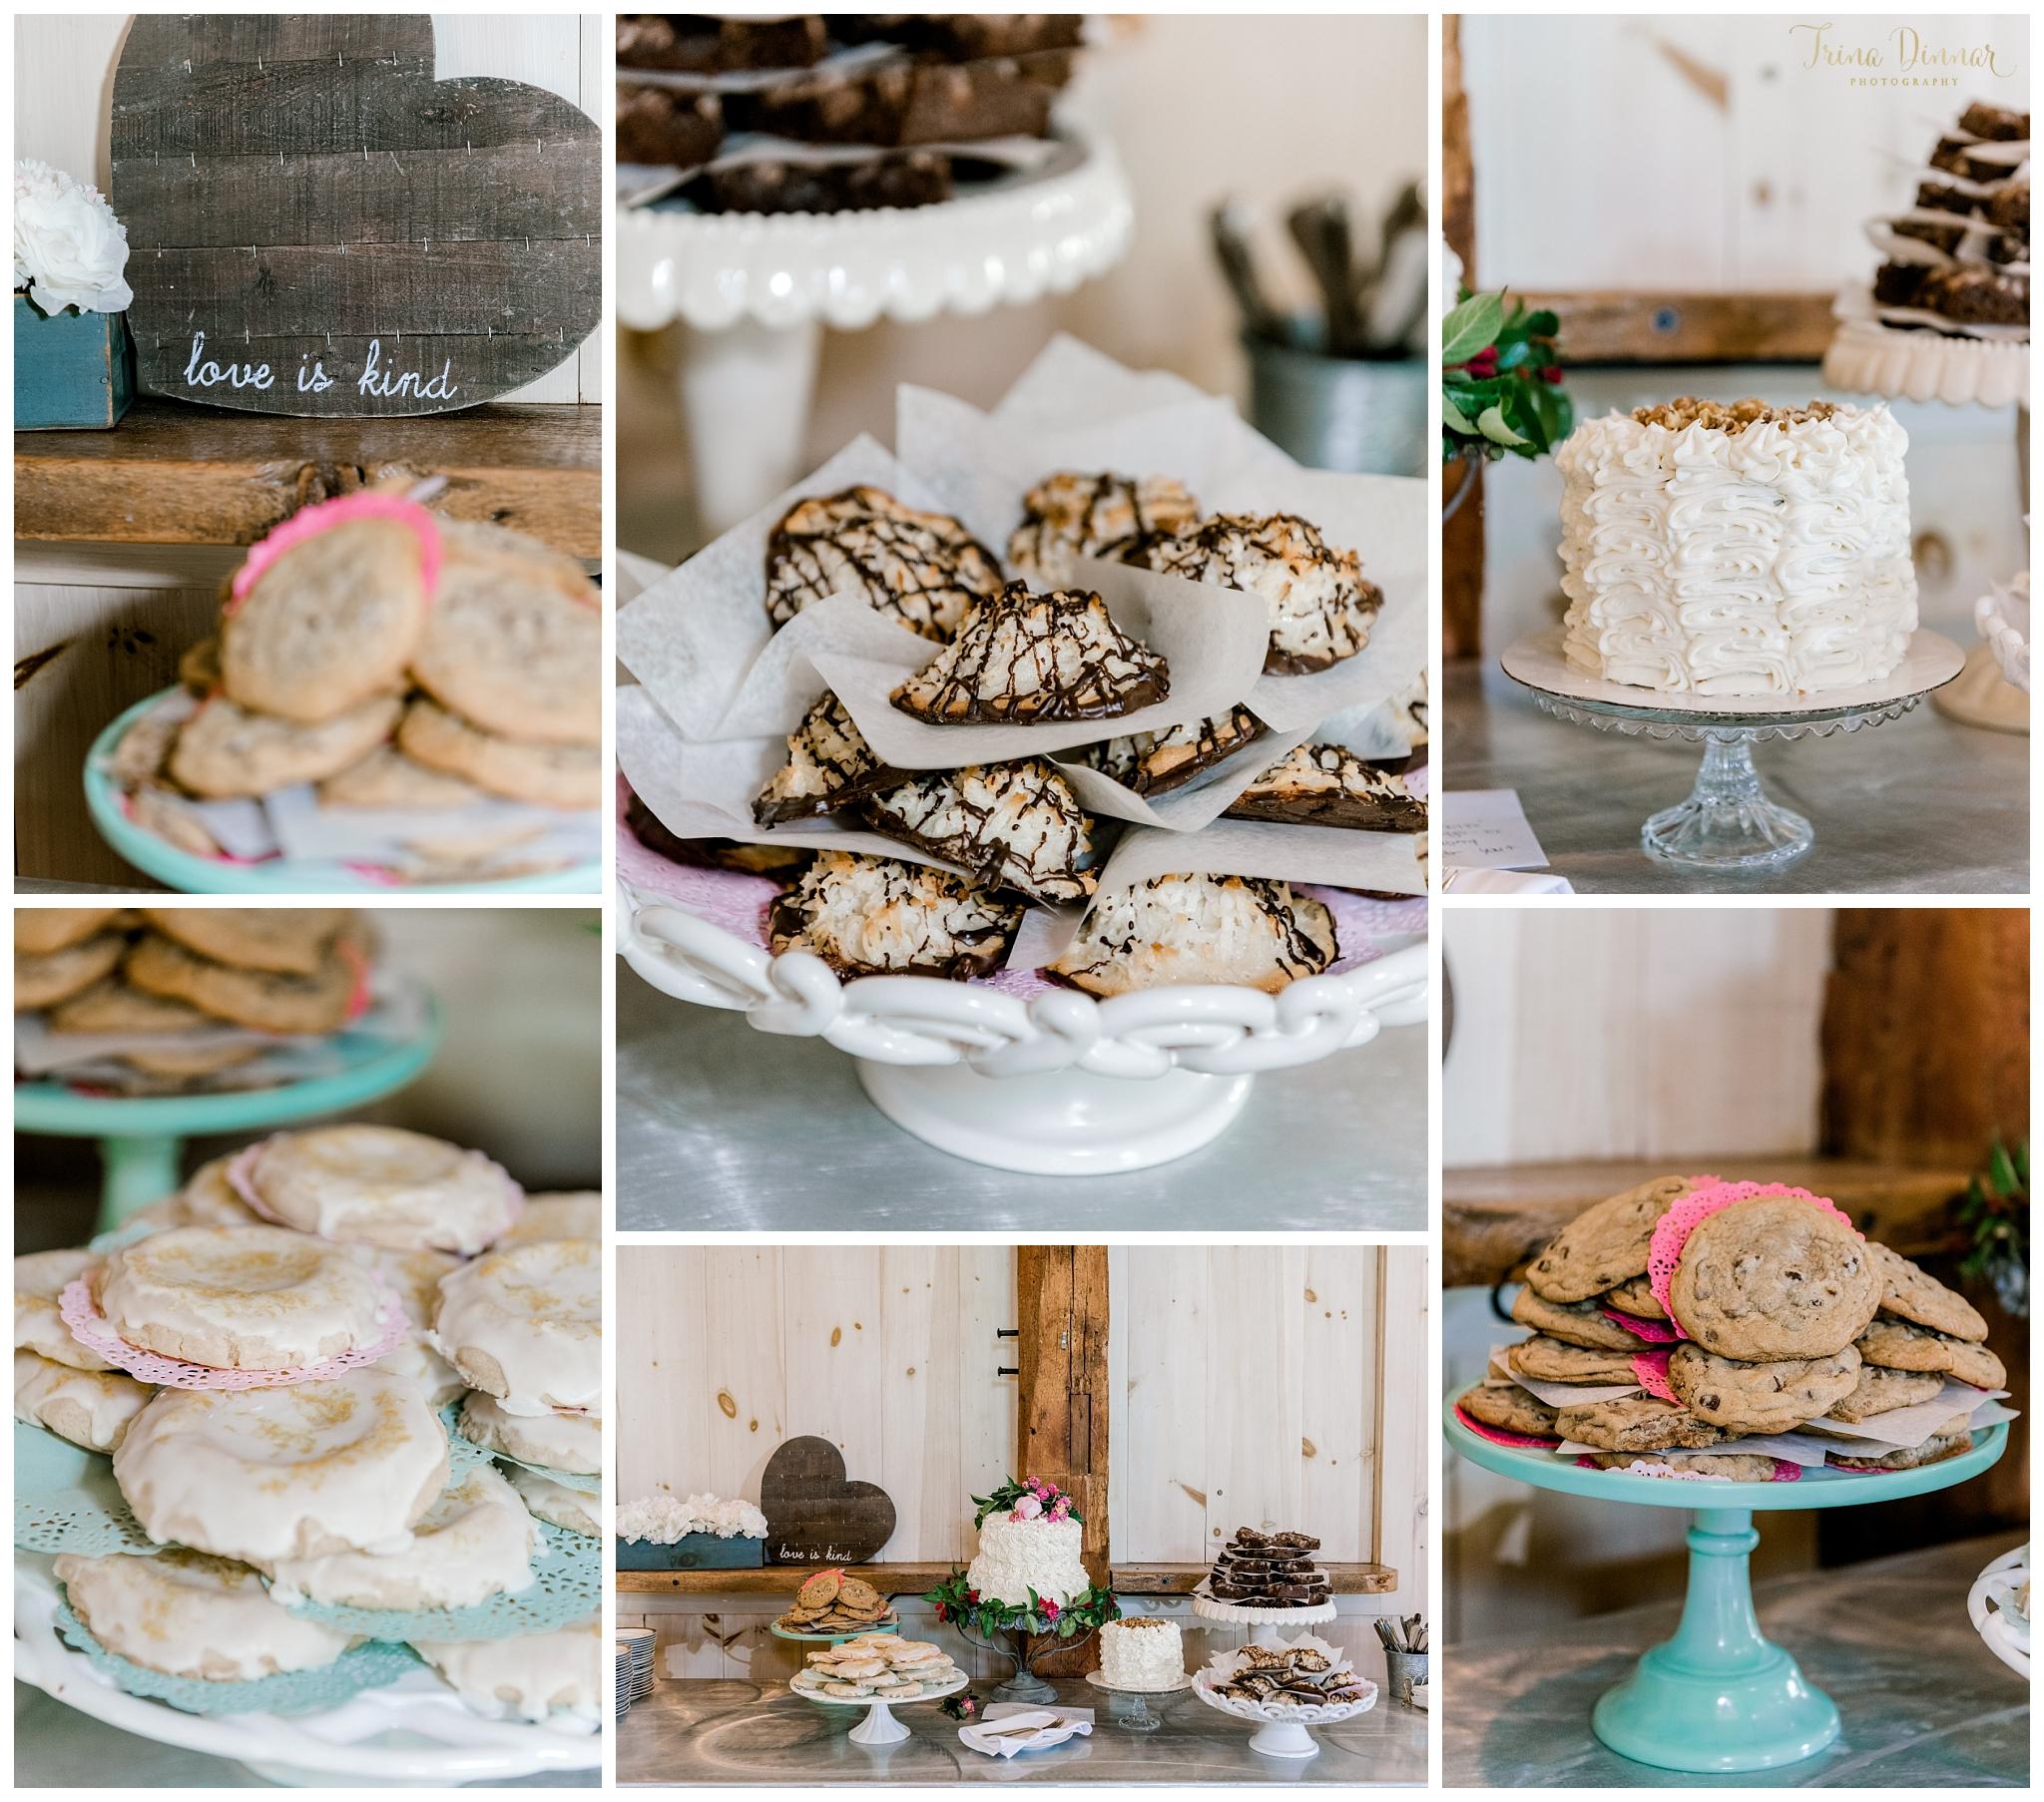 Maine Wedding Desserts by Rosalie Joy's Bakery